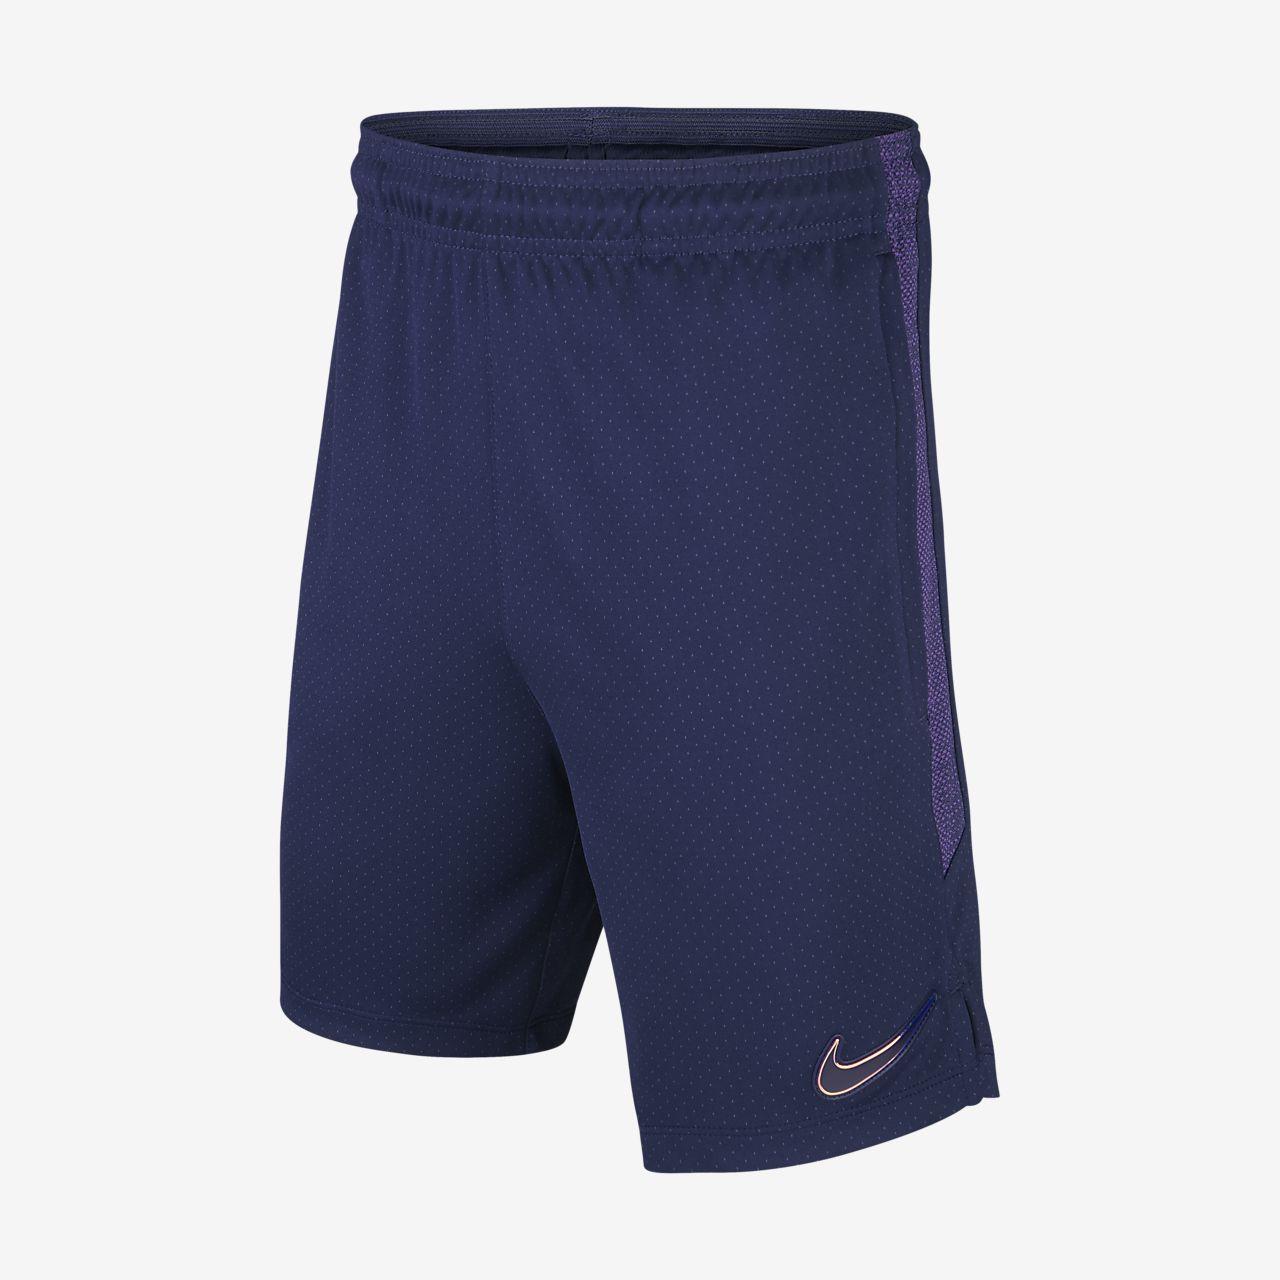 Nike Dri-FIT Tottenham Hotspur Strike Fußballshorts für ältere Kinder